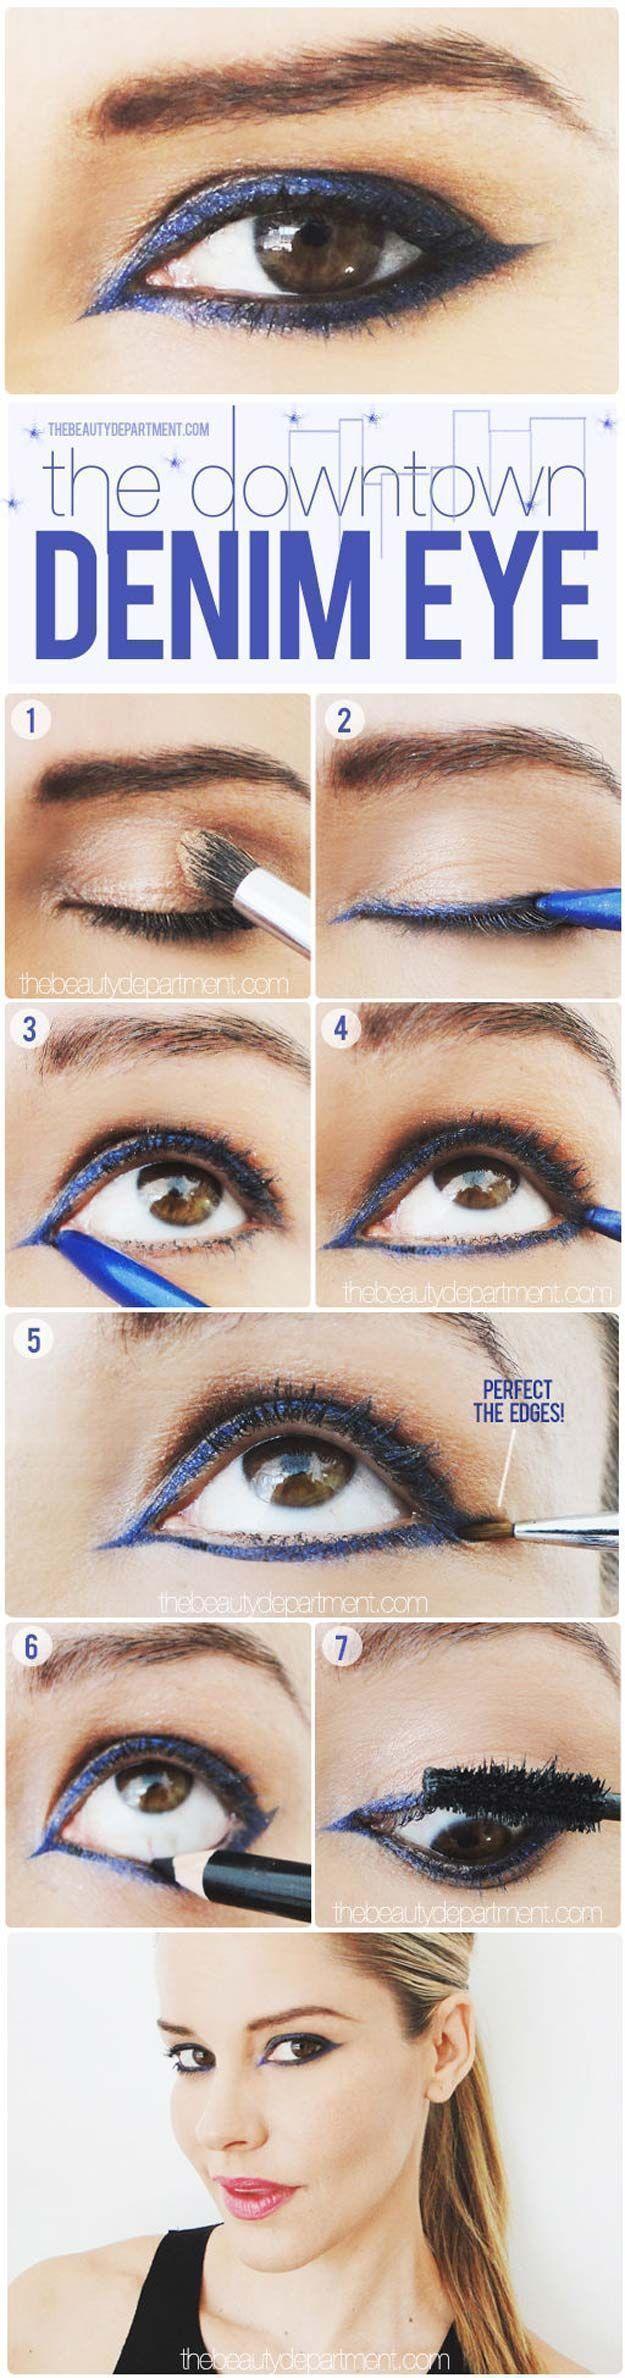 Best Eyeliner Tutorials - Indigo Girl - Simple And DIY Eyeliner Tutorials For Beginners. Includes Everyday Looks For Natural Eyes, Winged Eyeliner, Pencil, Felt, Liquid, and Gel Eyeliner Tips. Ideas For Small Eyes, Large Eyes, Blue Eyes, Brown Eyes, Hazel Eyes, and Green Eyes - http://thegoddess.com/best-eyeliner-tutorials #smallwingedliner